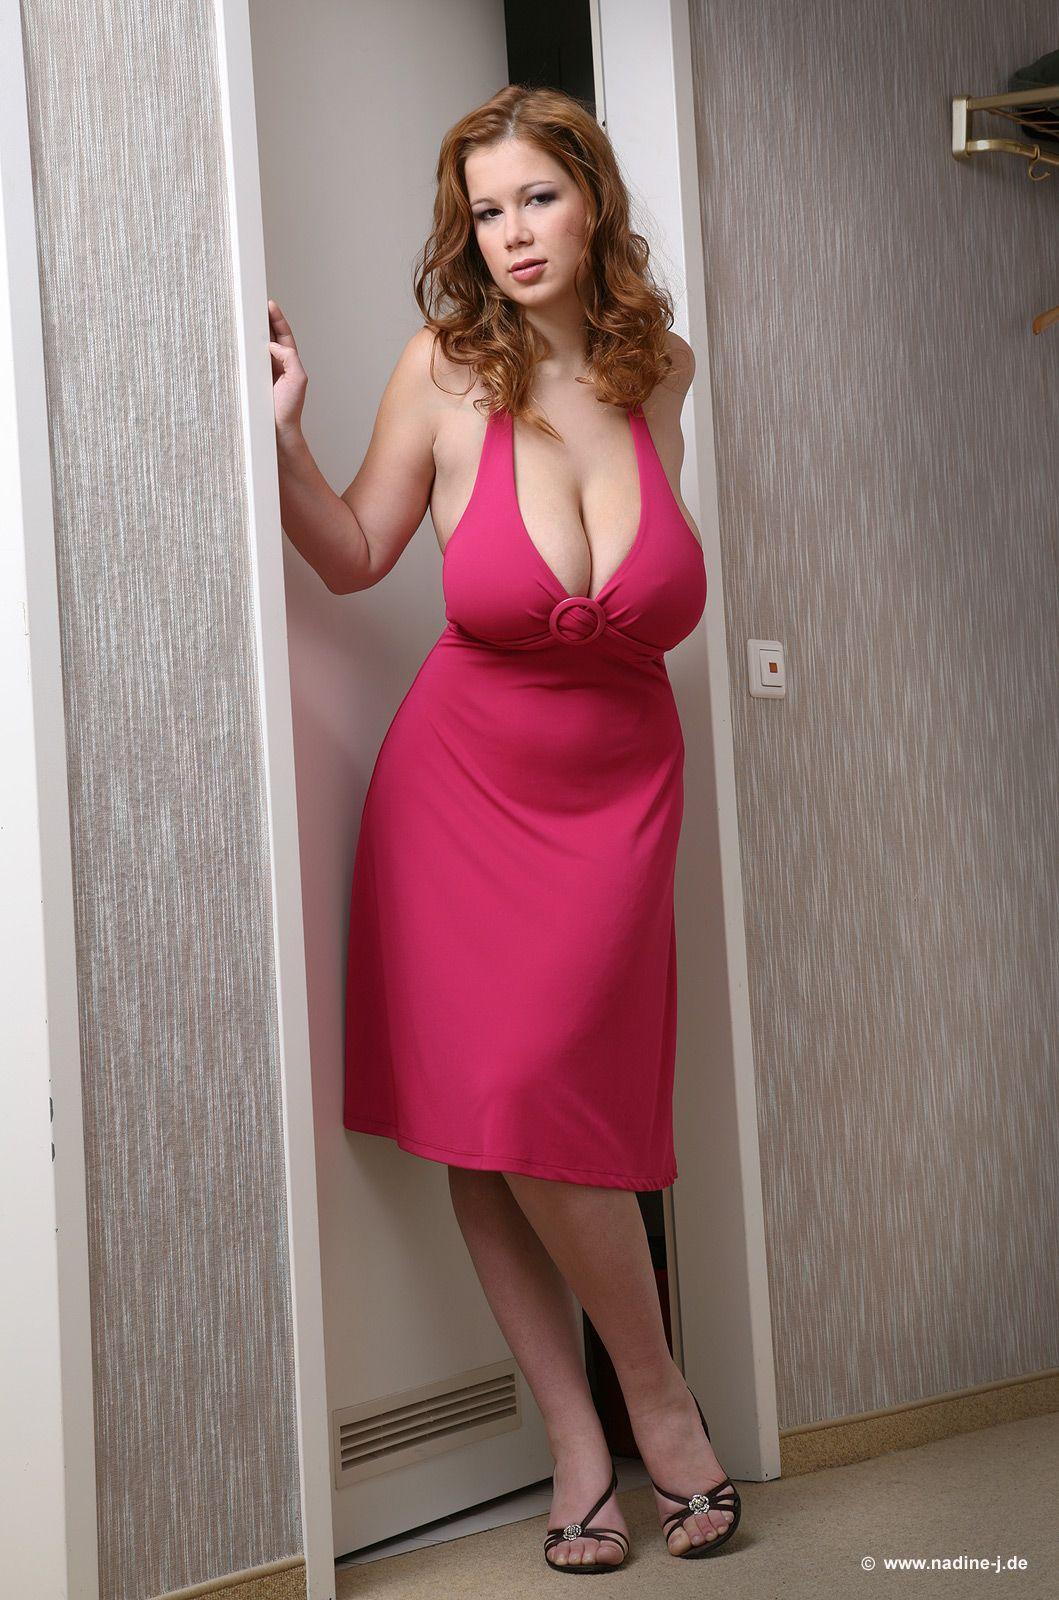 Nadine Jansens Models Terry Nova 2008